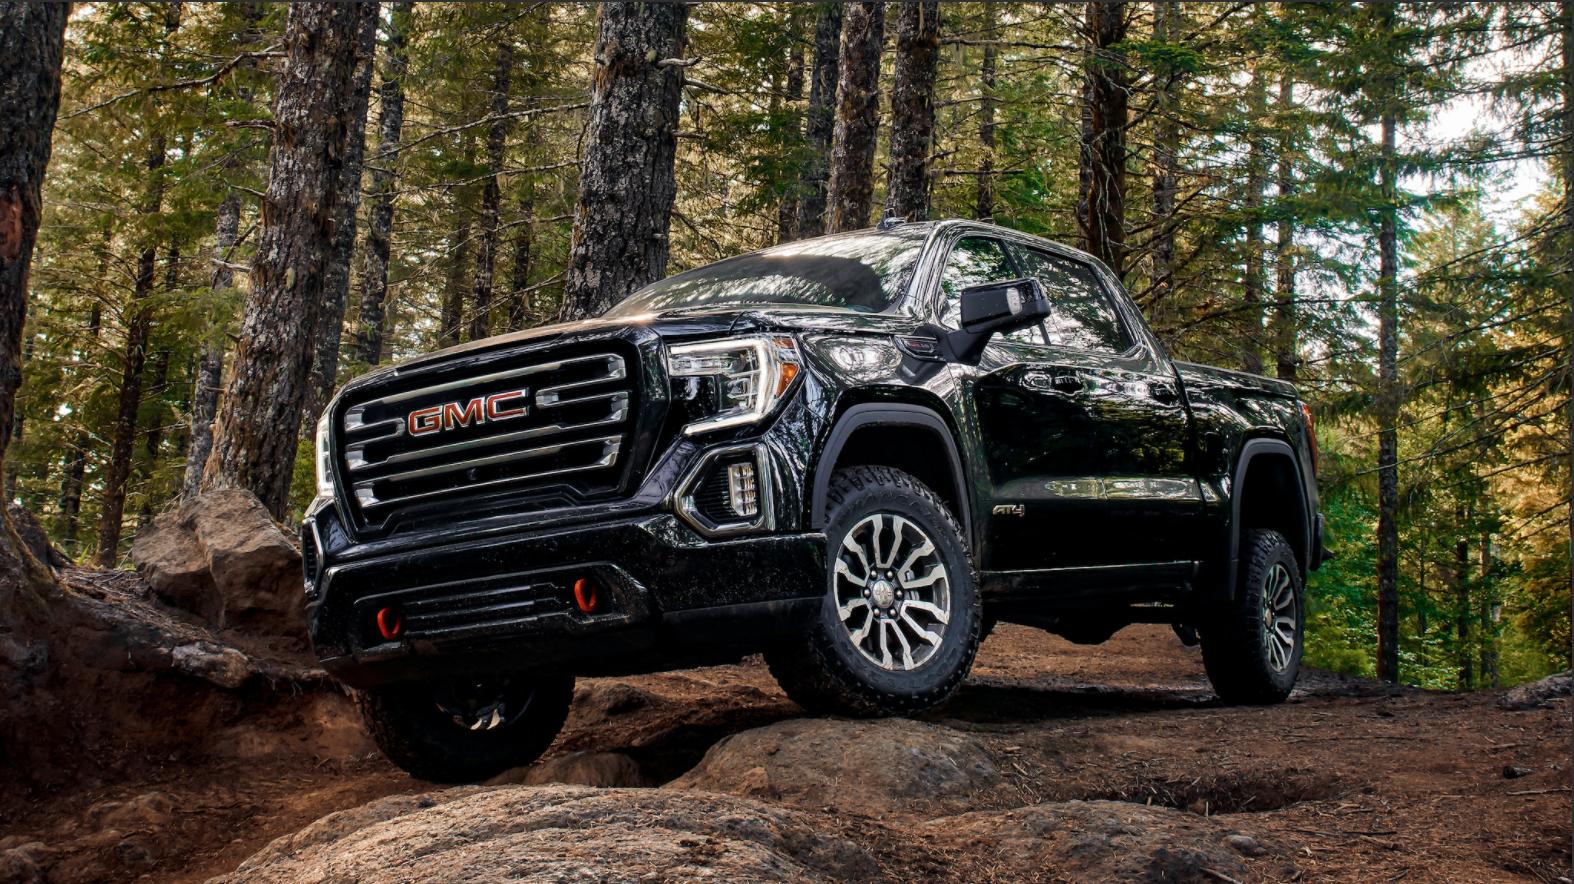 Take the New 2020 GMC Sierra offroad. Take it anywhere.